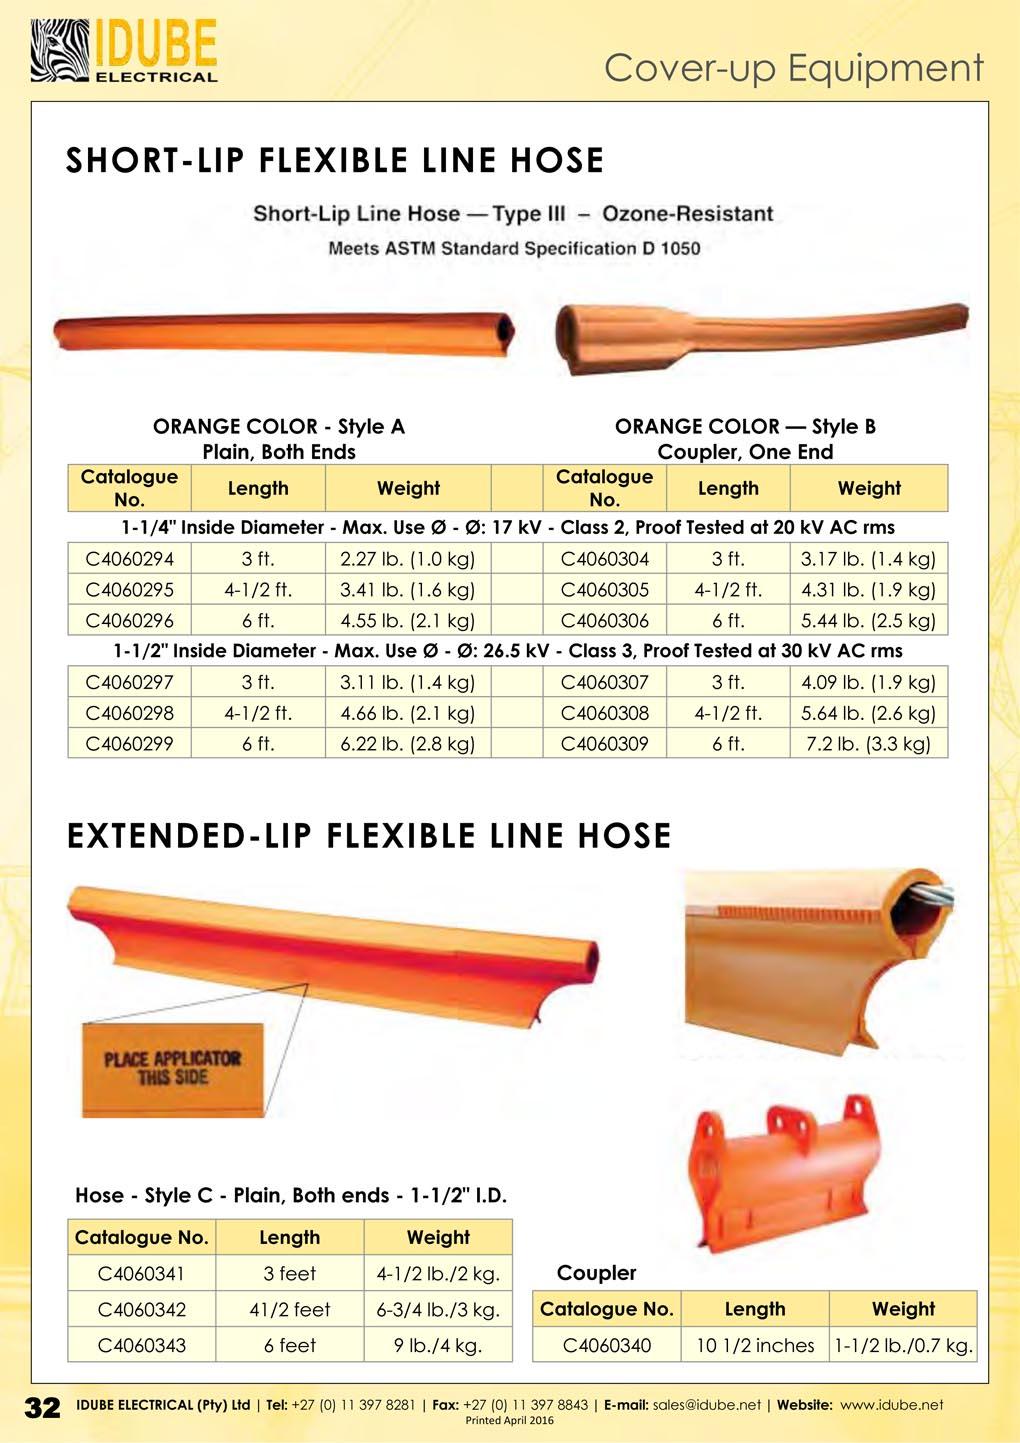 Idube Flexible LIne Hoses - 1020 x 1443